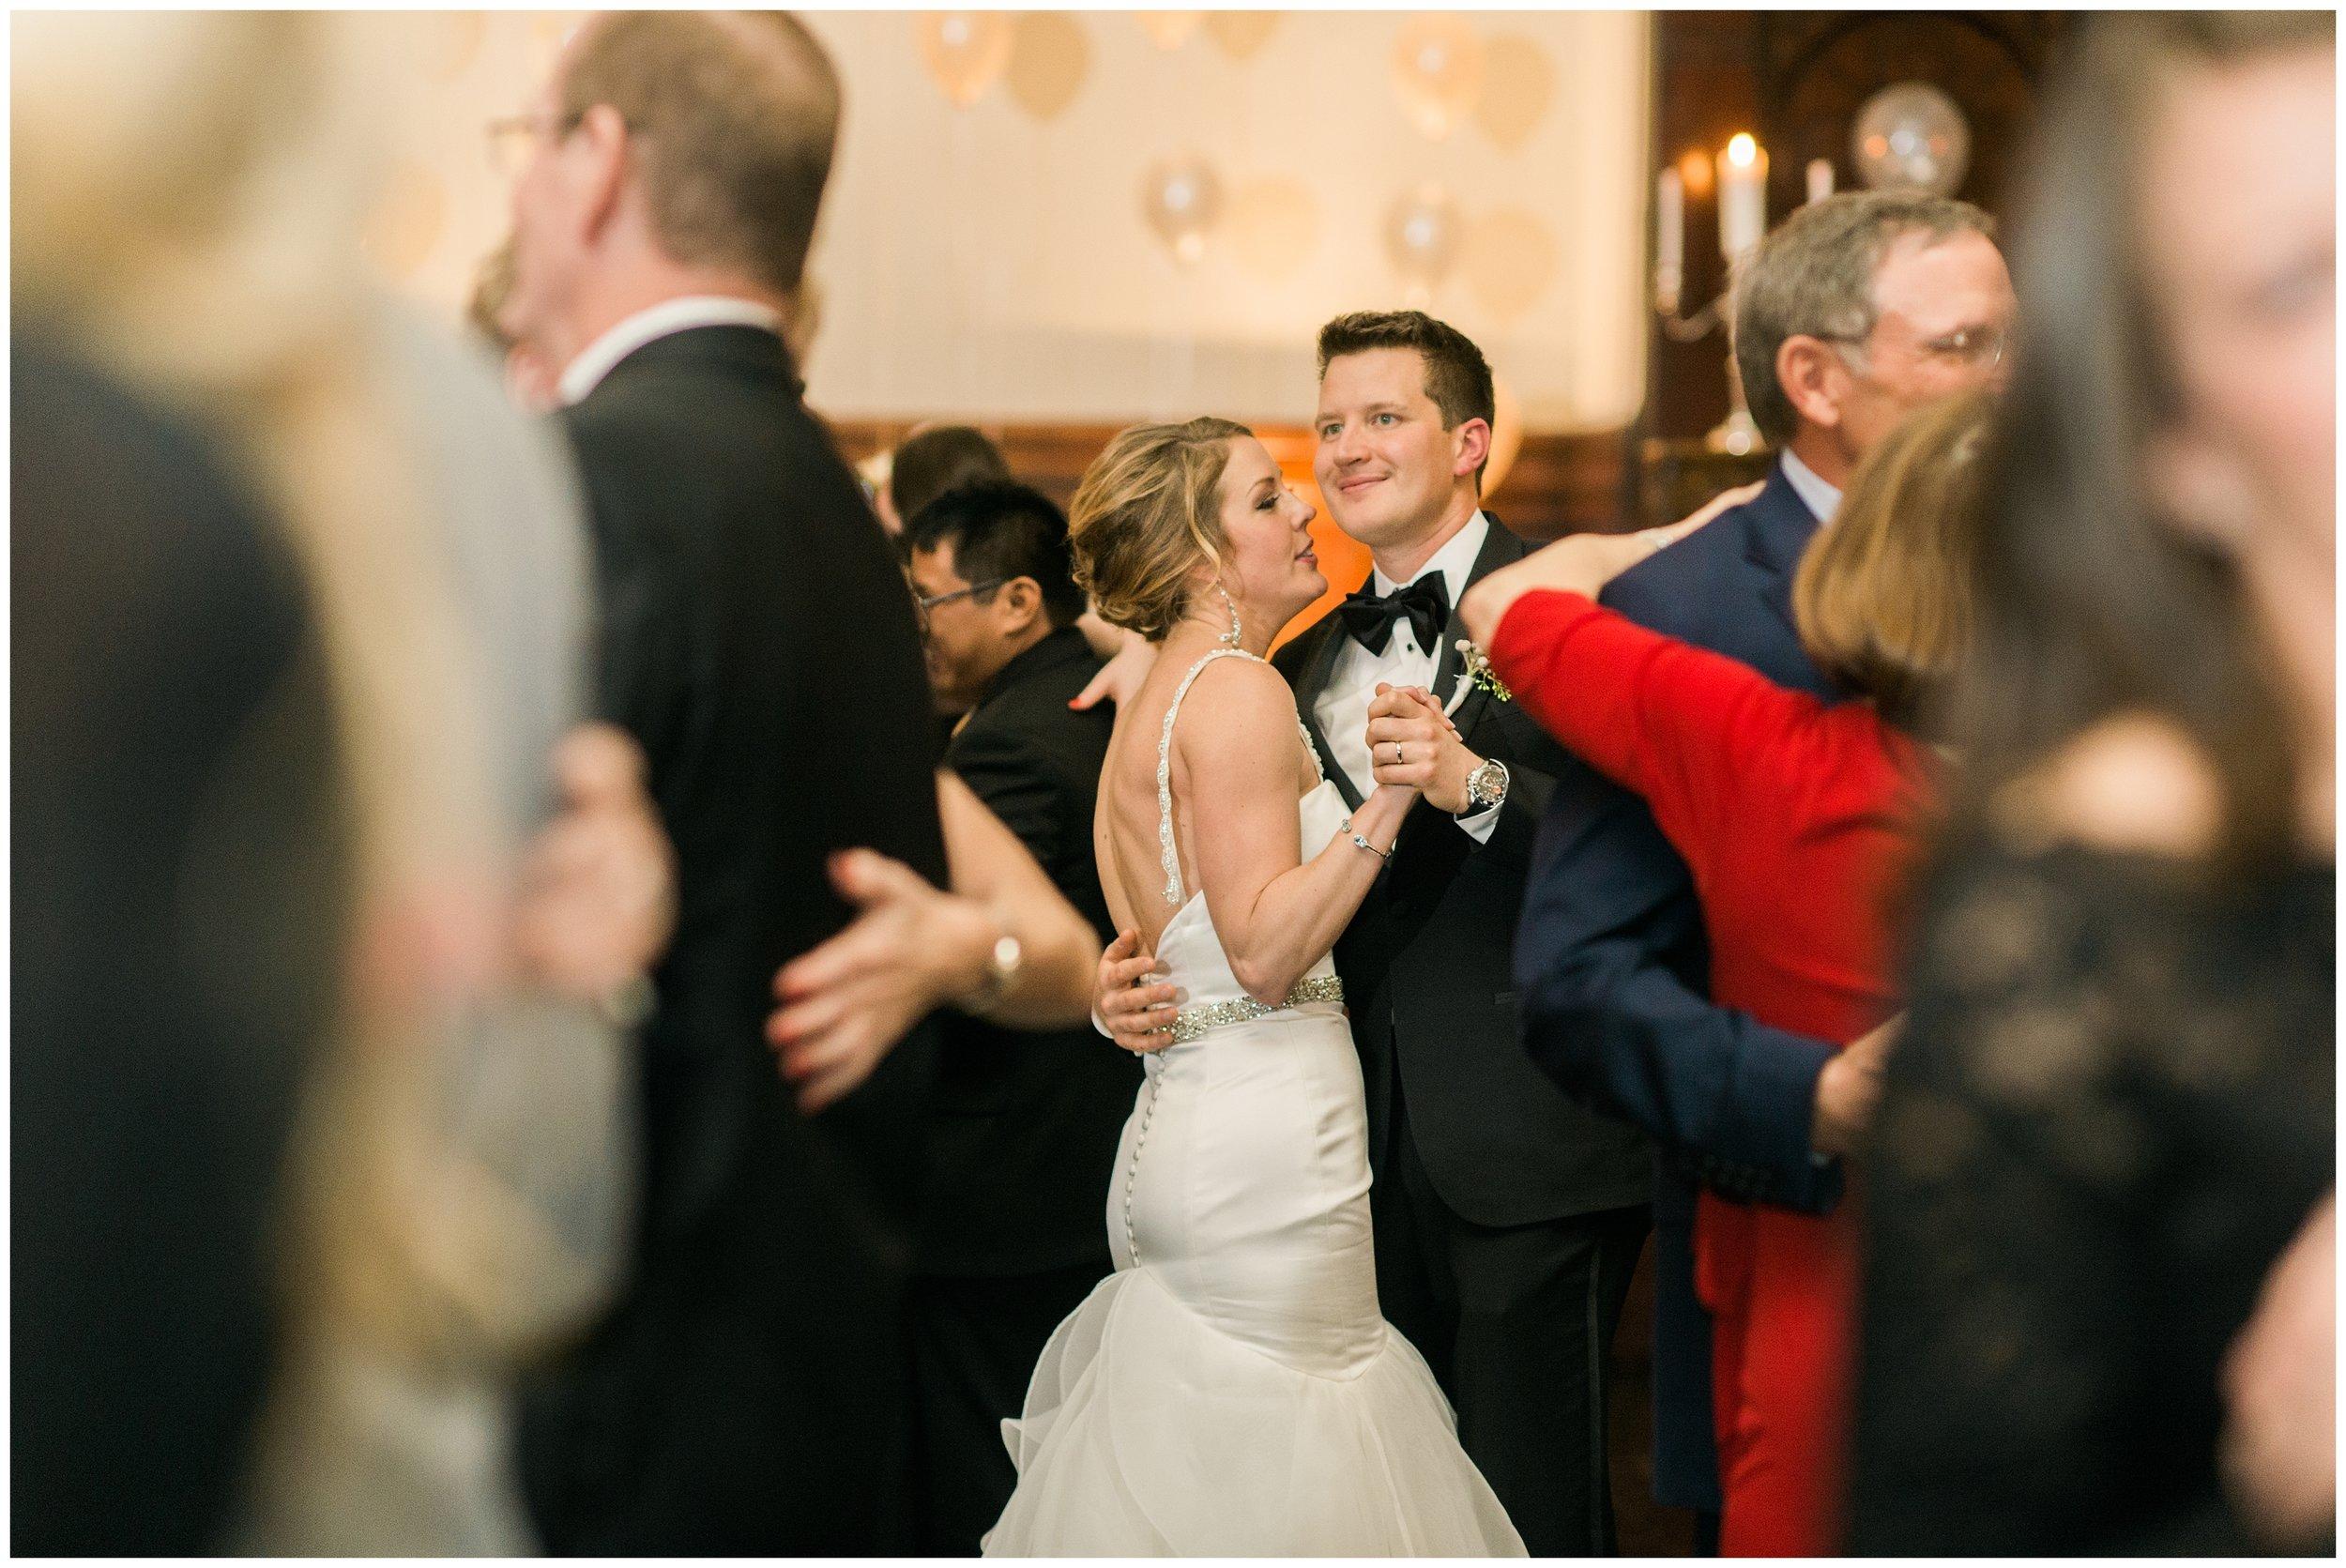 Rebecca_Bridges_Photography_Indianapolis_Wedding_Photographer_5858.jpg